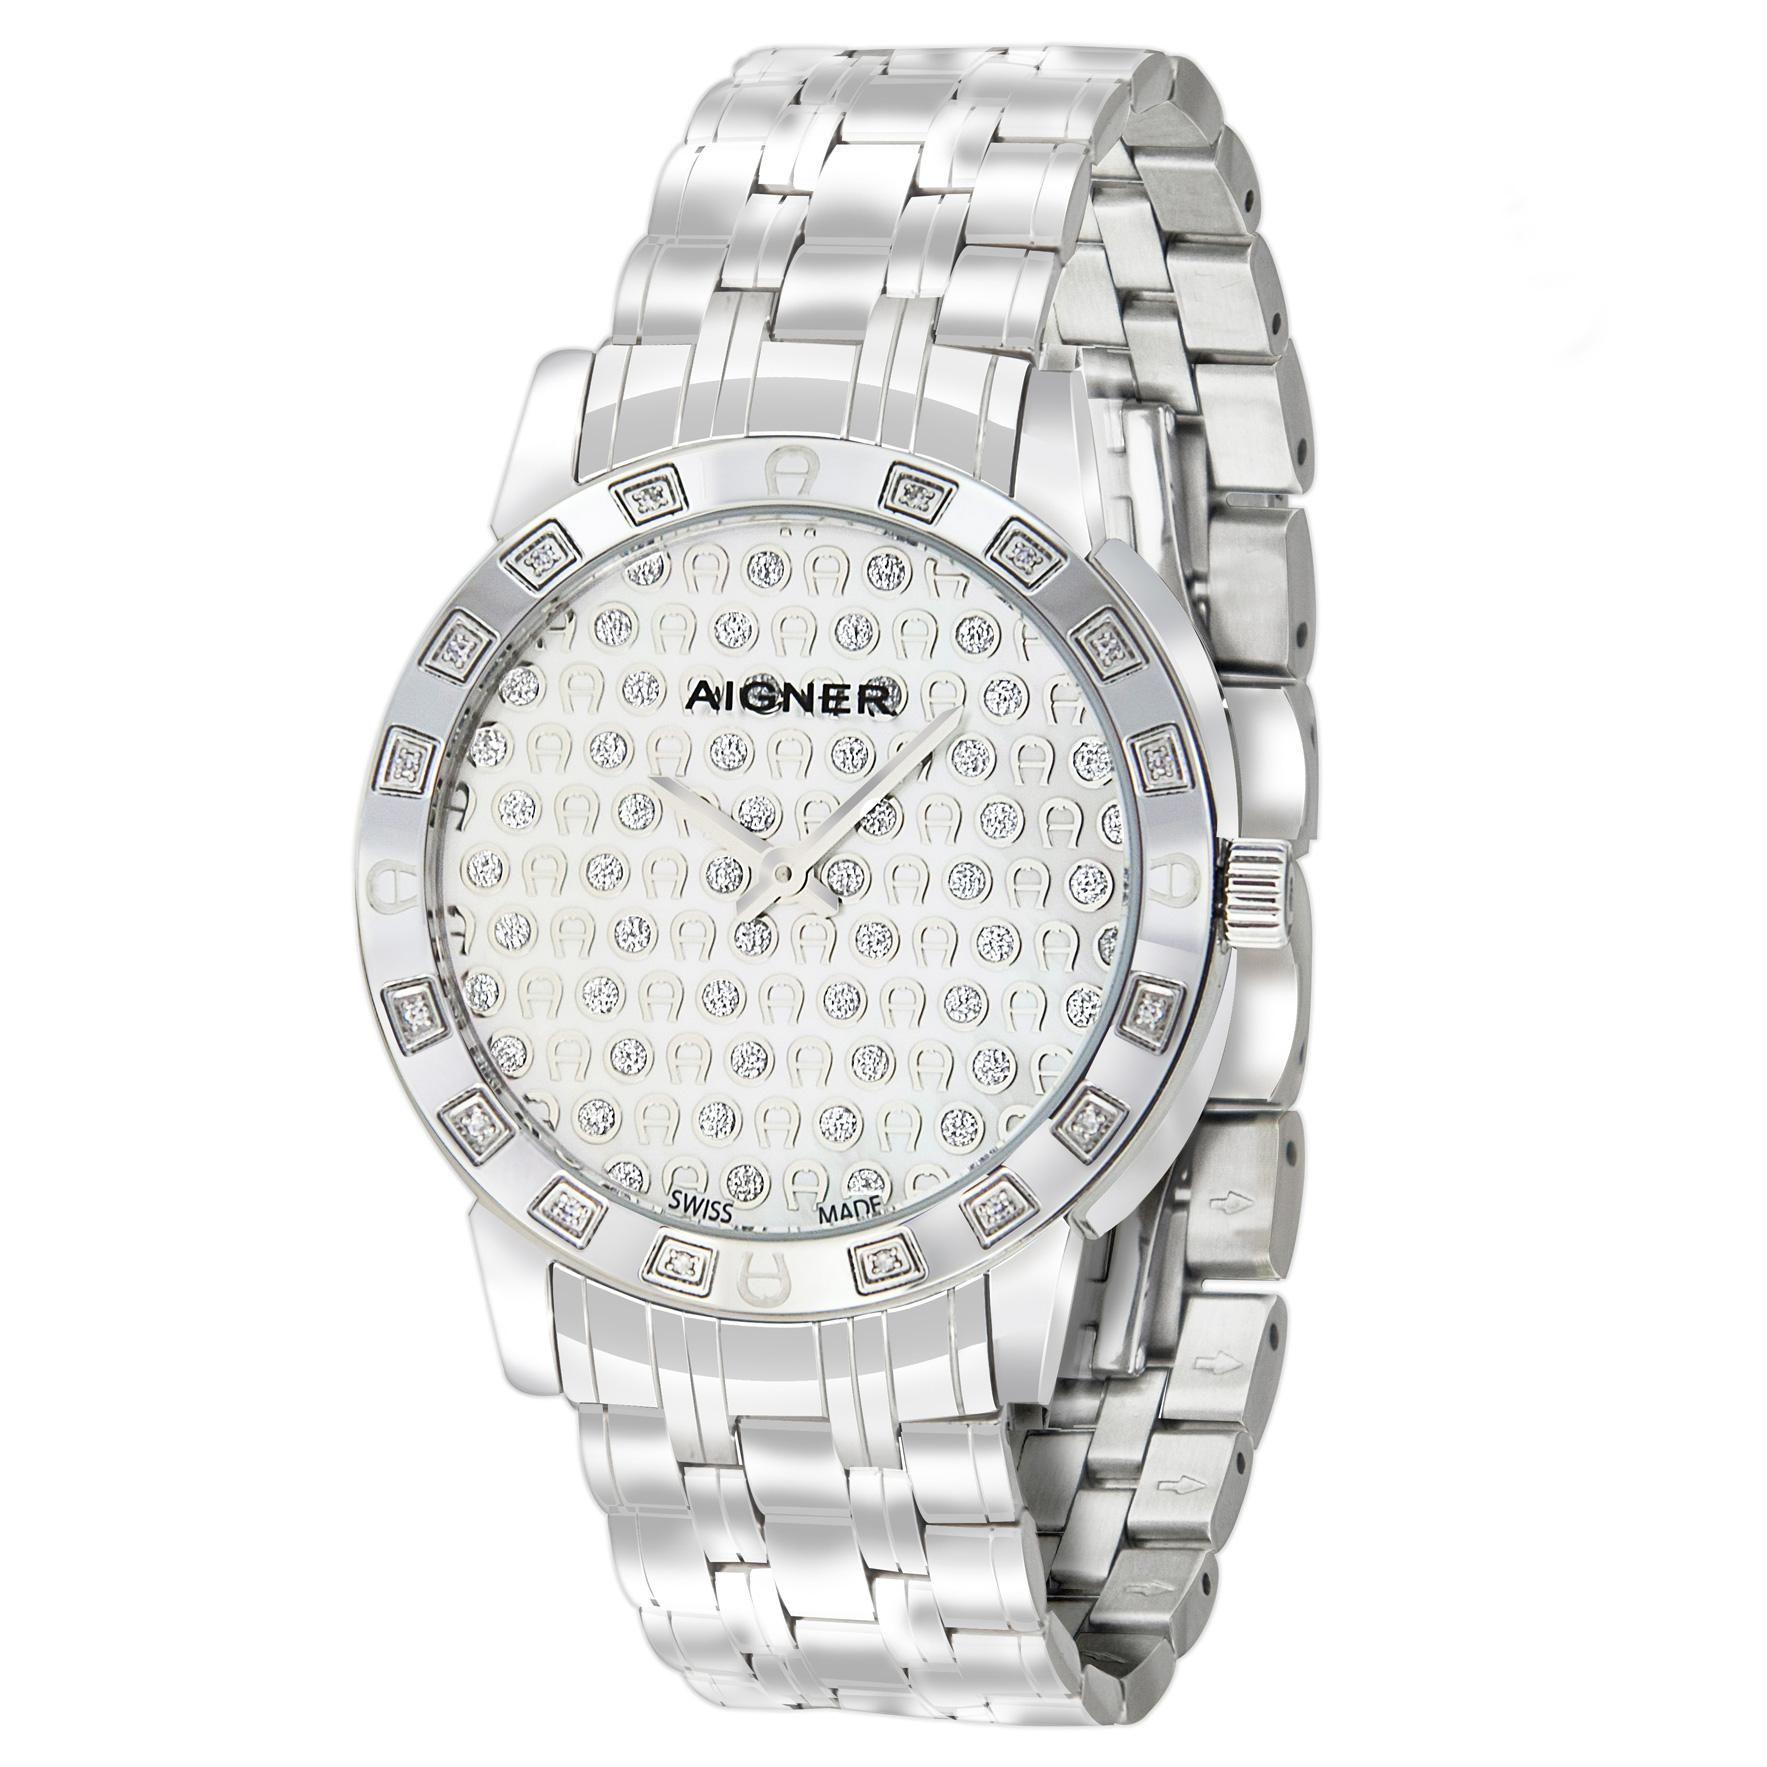 Aigner Cortina Ladies Stainless Steel Diamond Watch Women Bracelet A26360